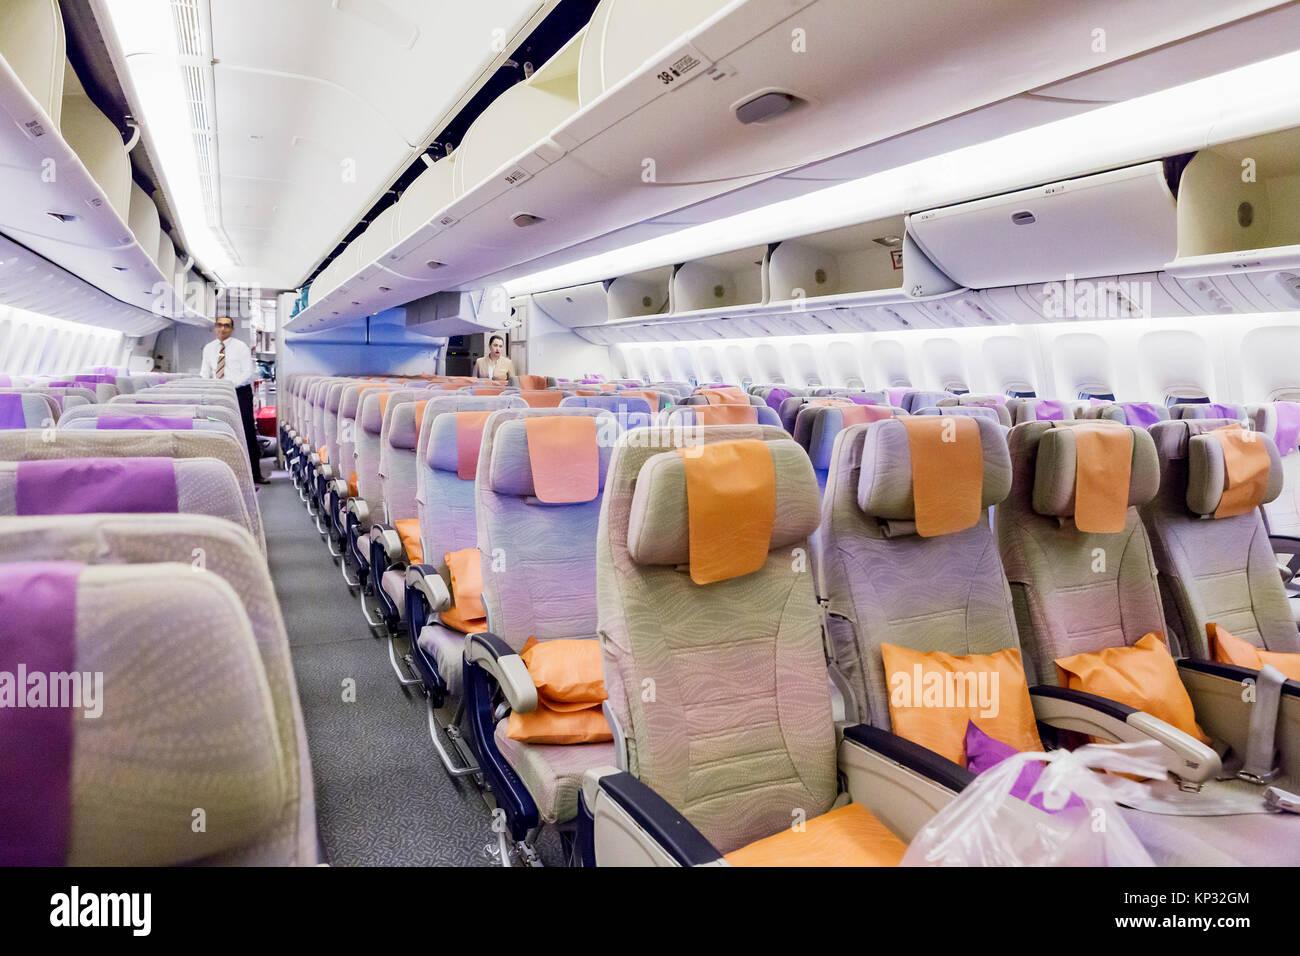 Emirates plane seat stock photos emirates plane seat for Boeing 777 interior